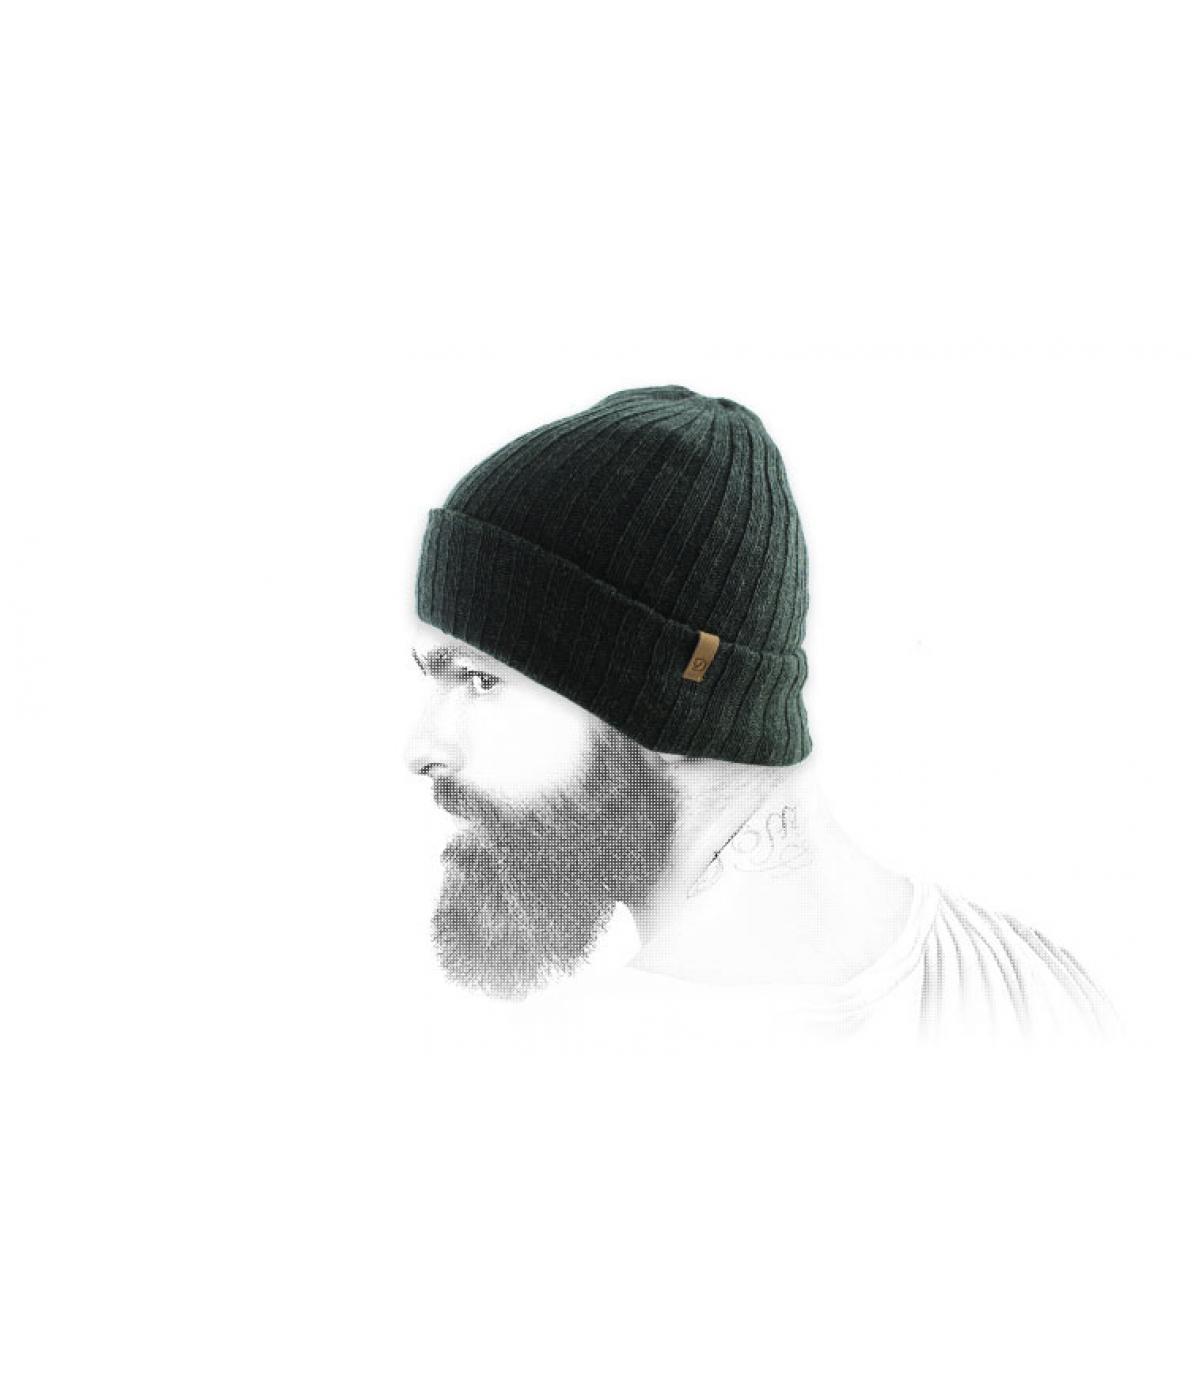 Mütze Revers dunkelgrün